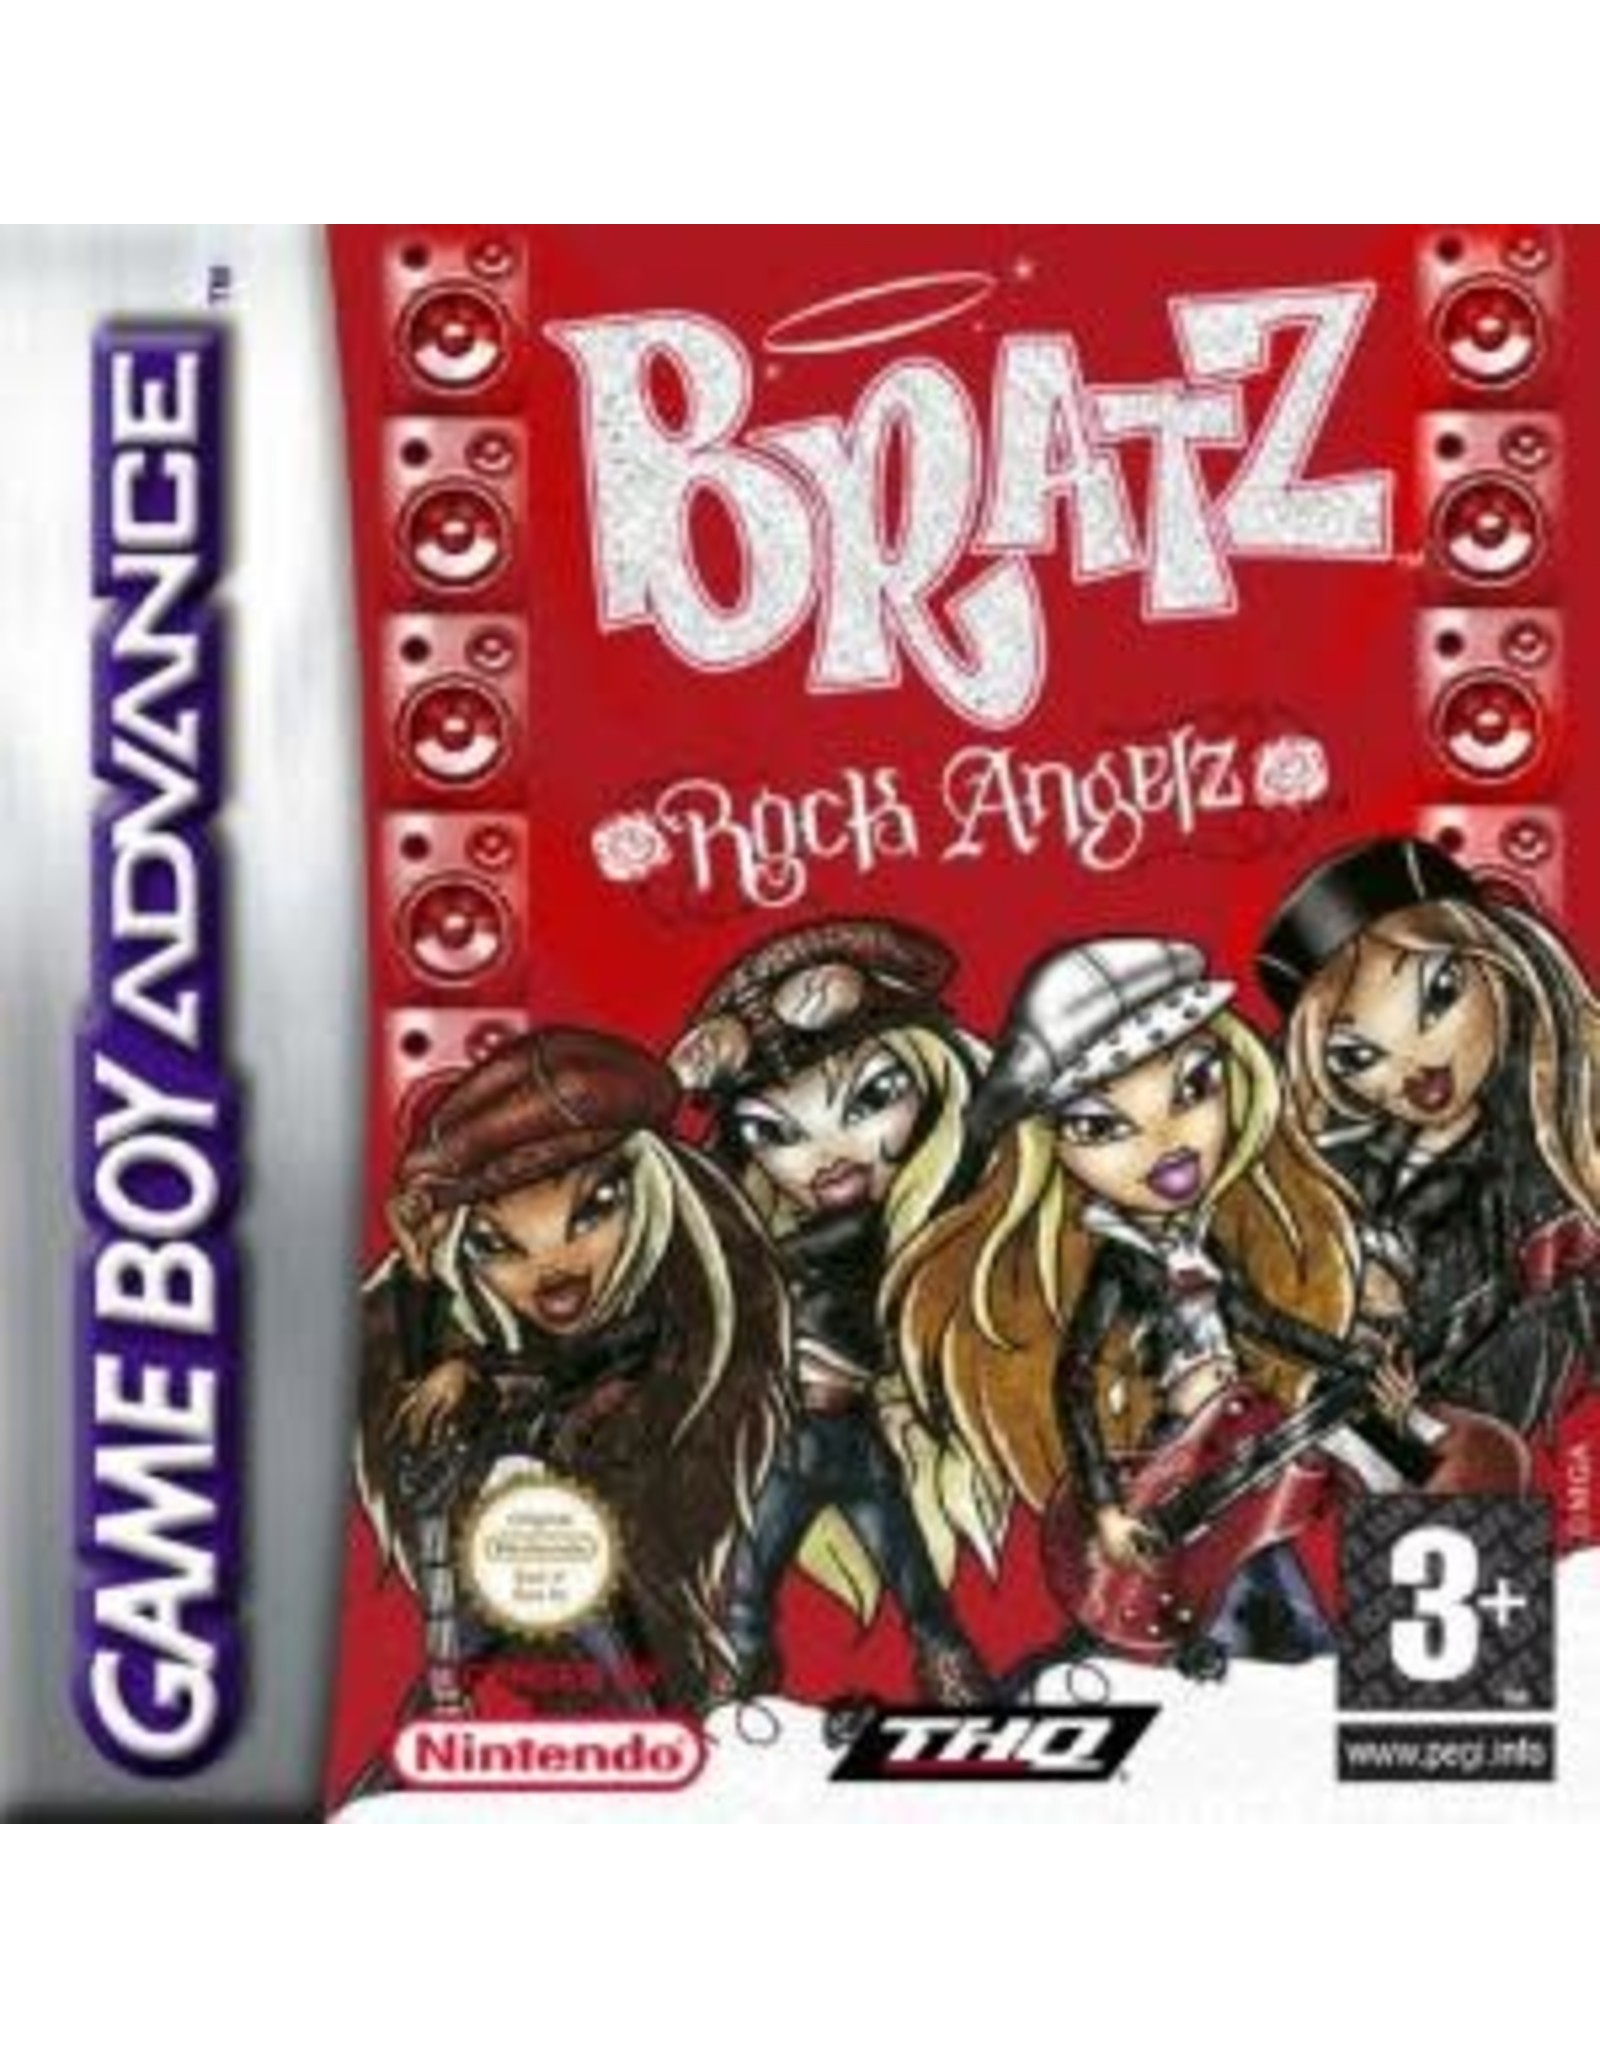 GameBoy Advance Bratz Rock Angelz (Cart Only)